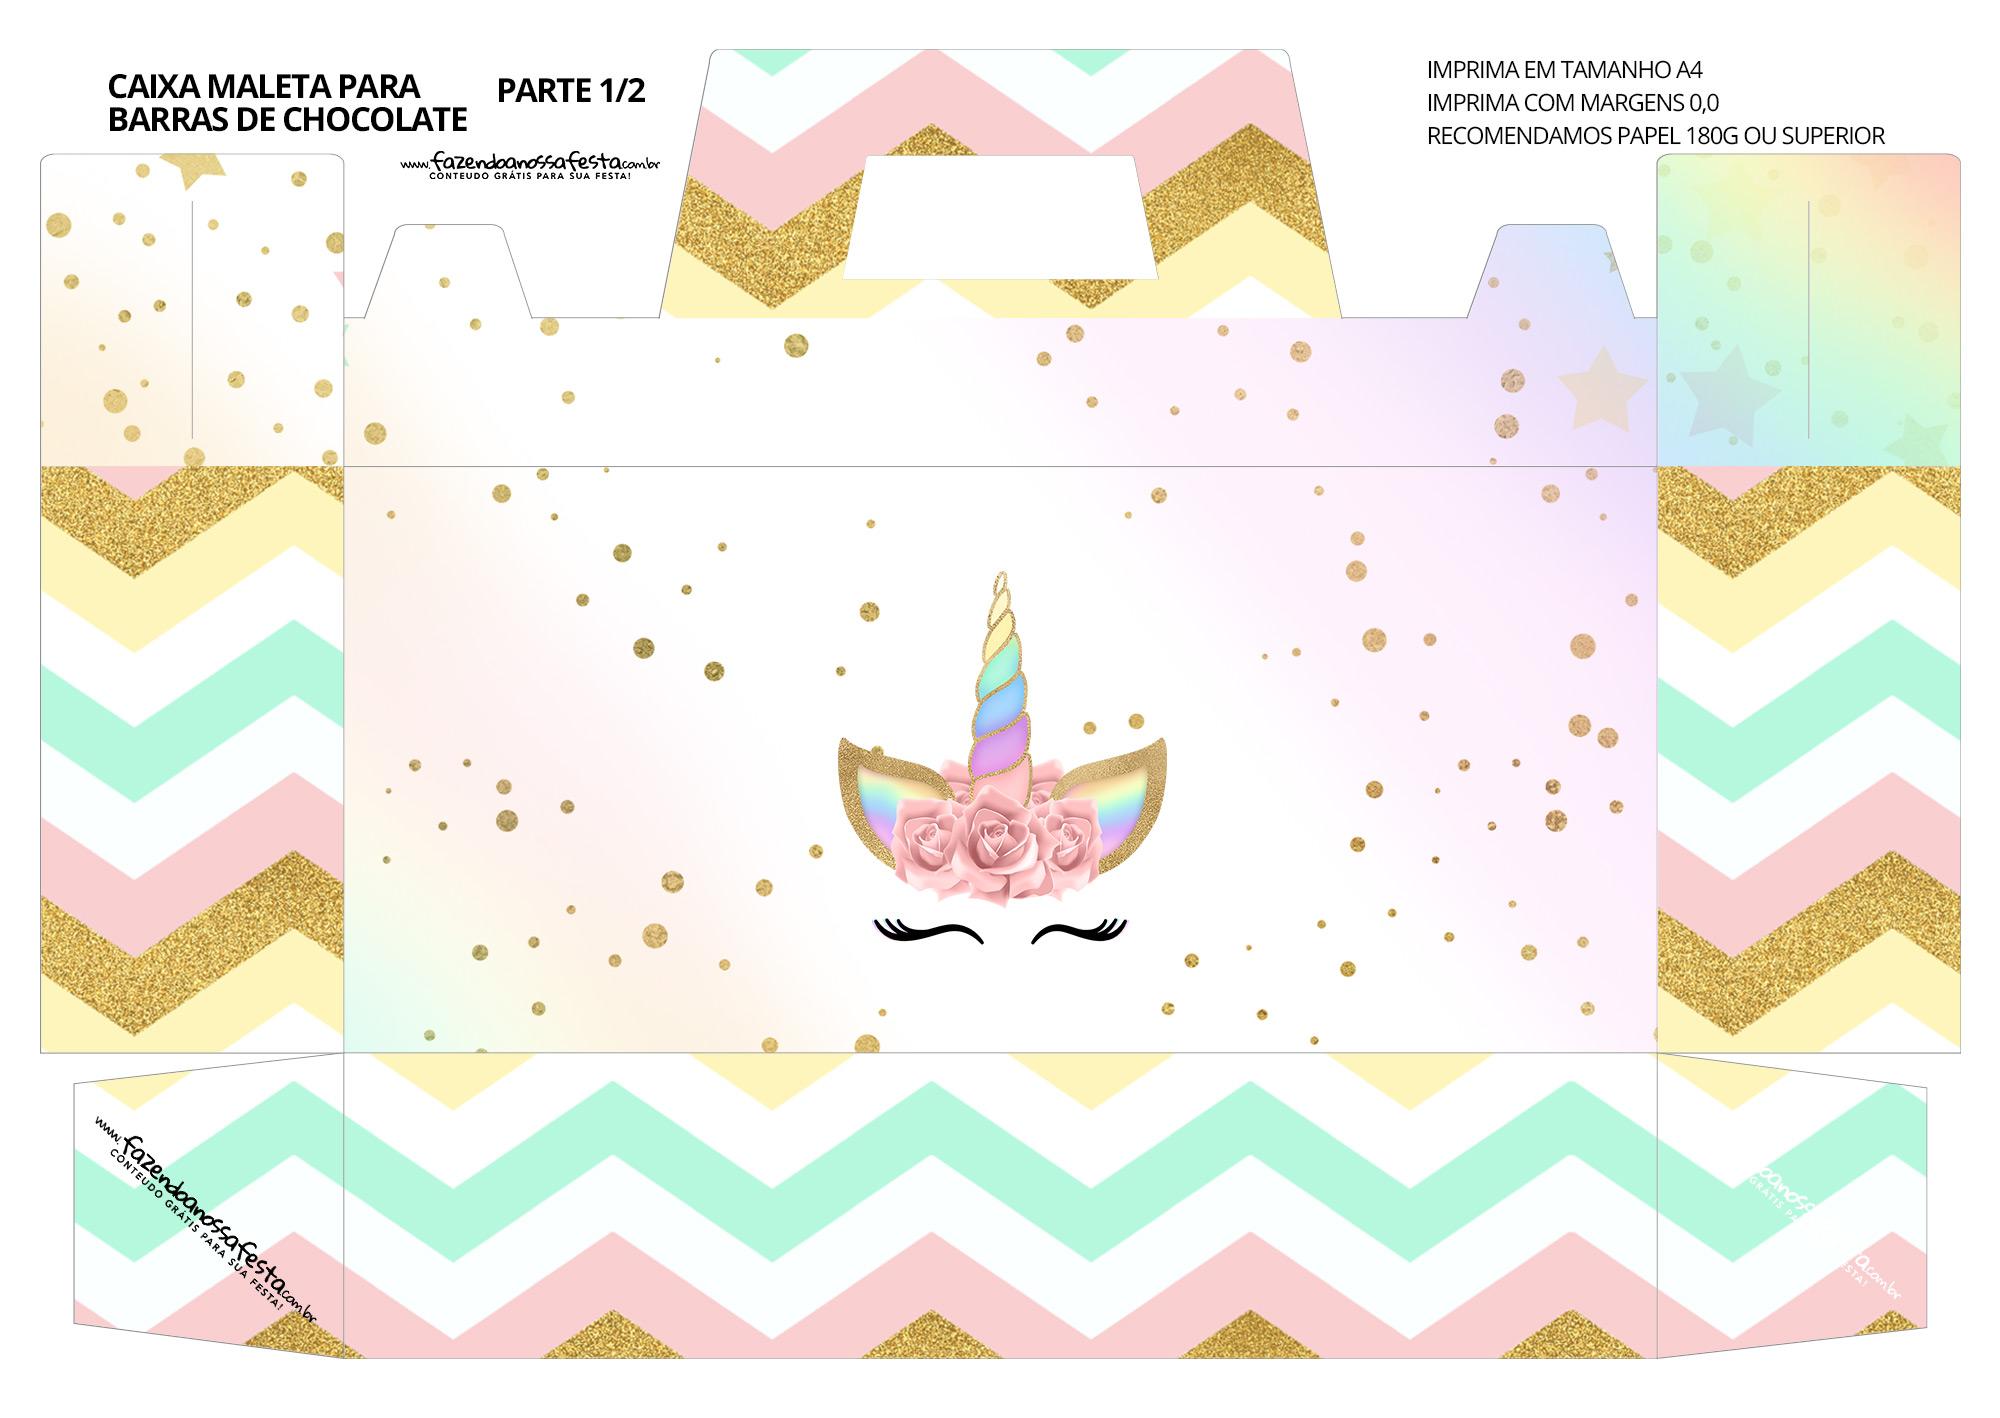 Caixa Maleta para Páscoa Personagens Unicornio 2 01